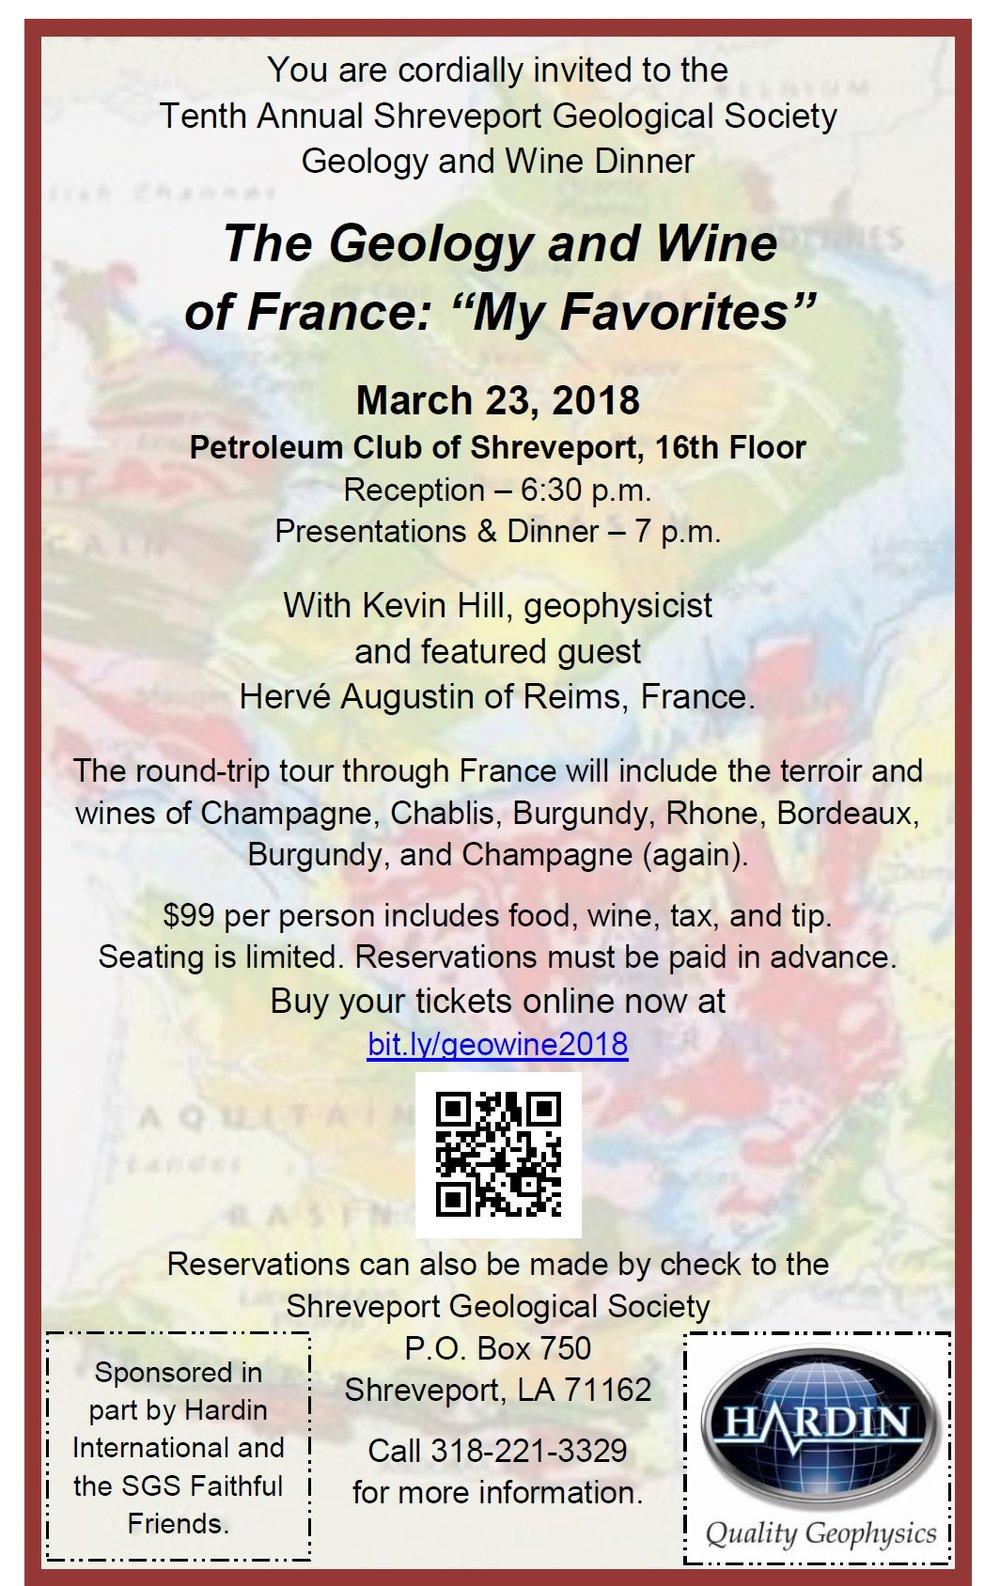 SGS Geology and Wine 2018 - France - My Favorites.jpg